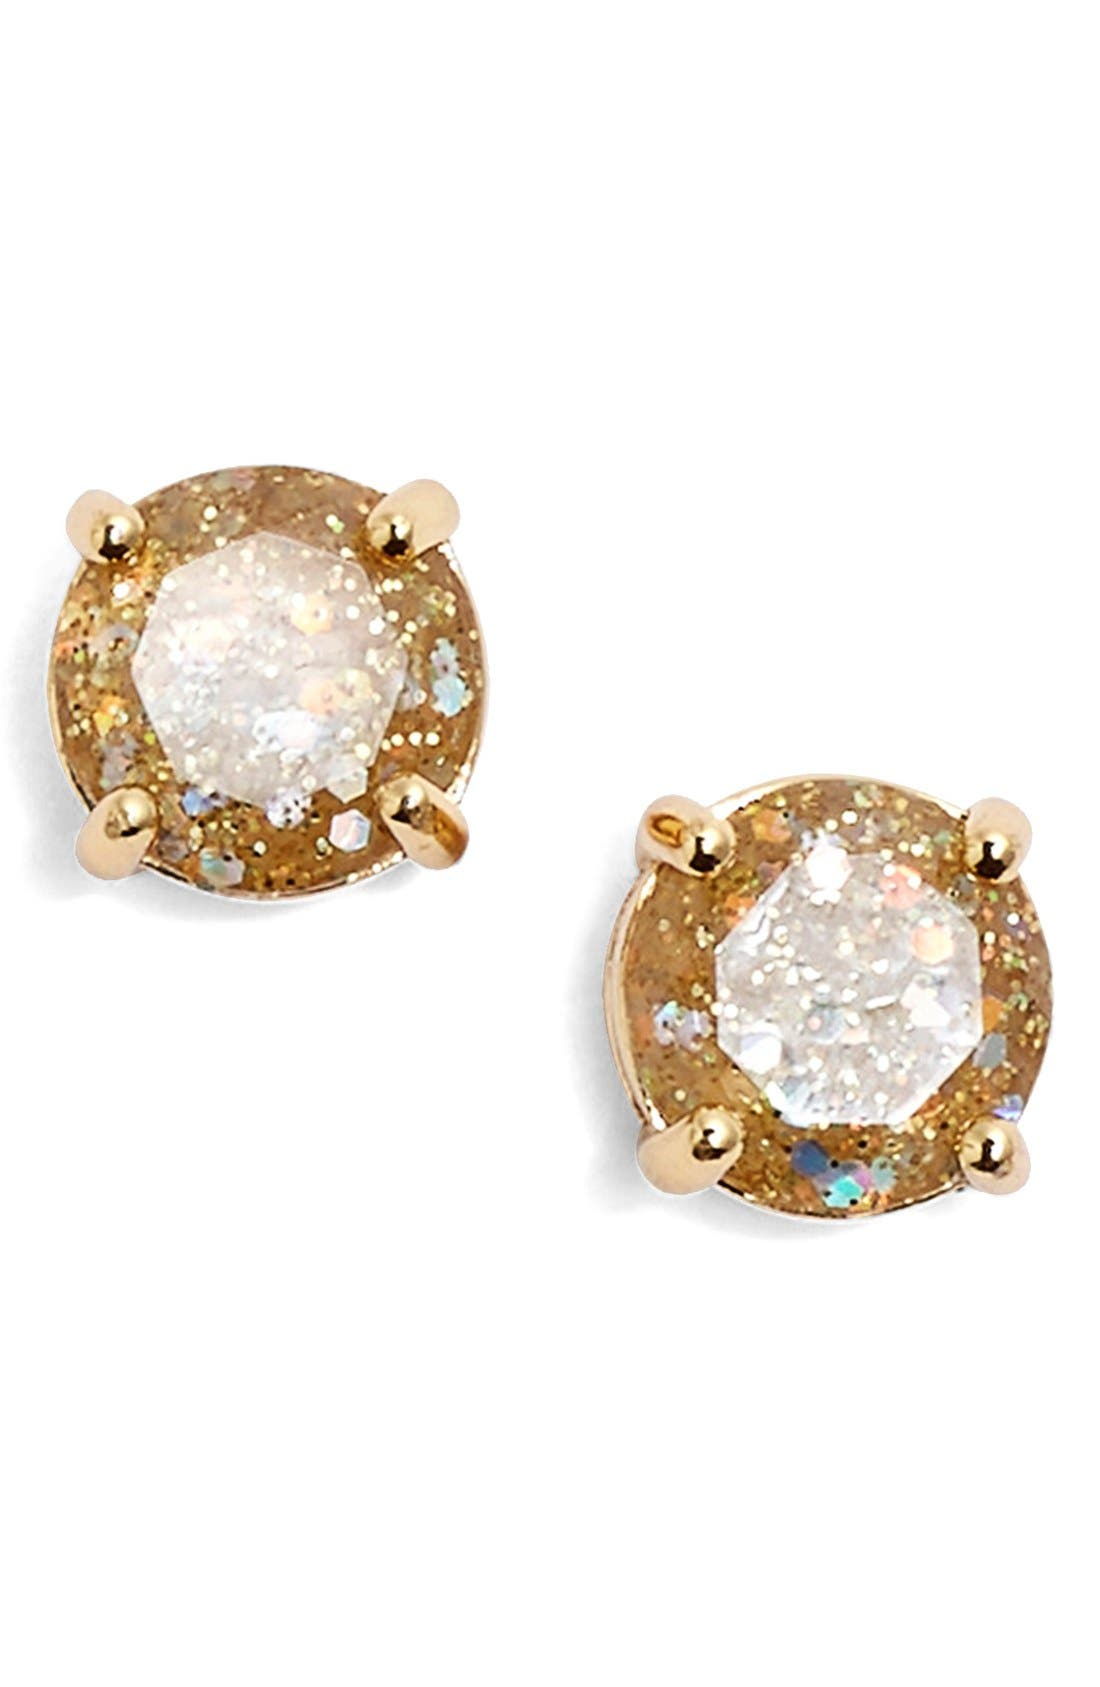 Main Image - kate spade new york 'mini glitter' stud earrings